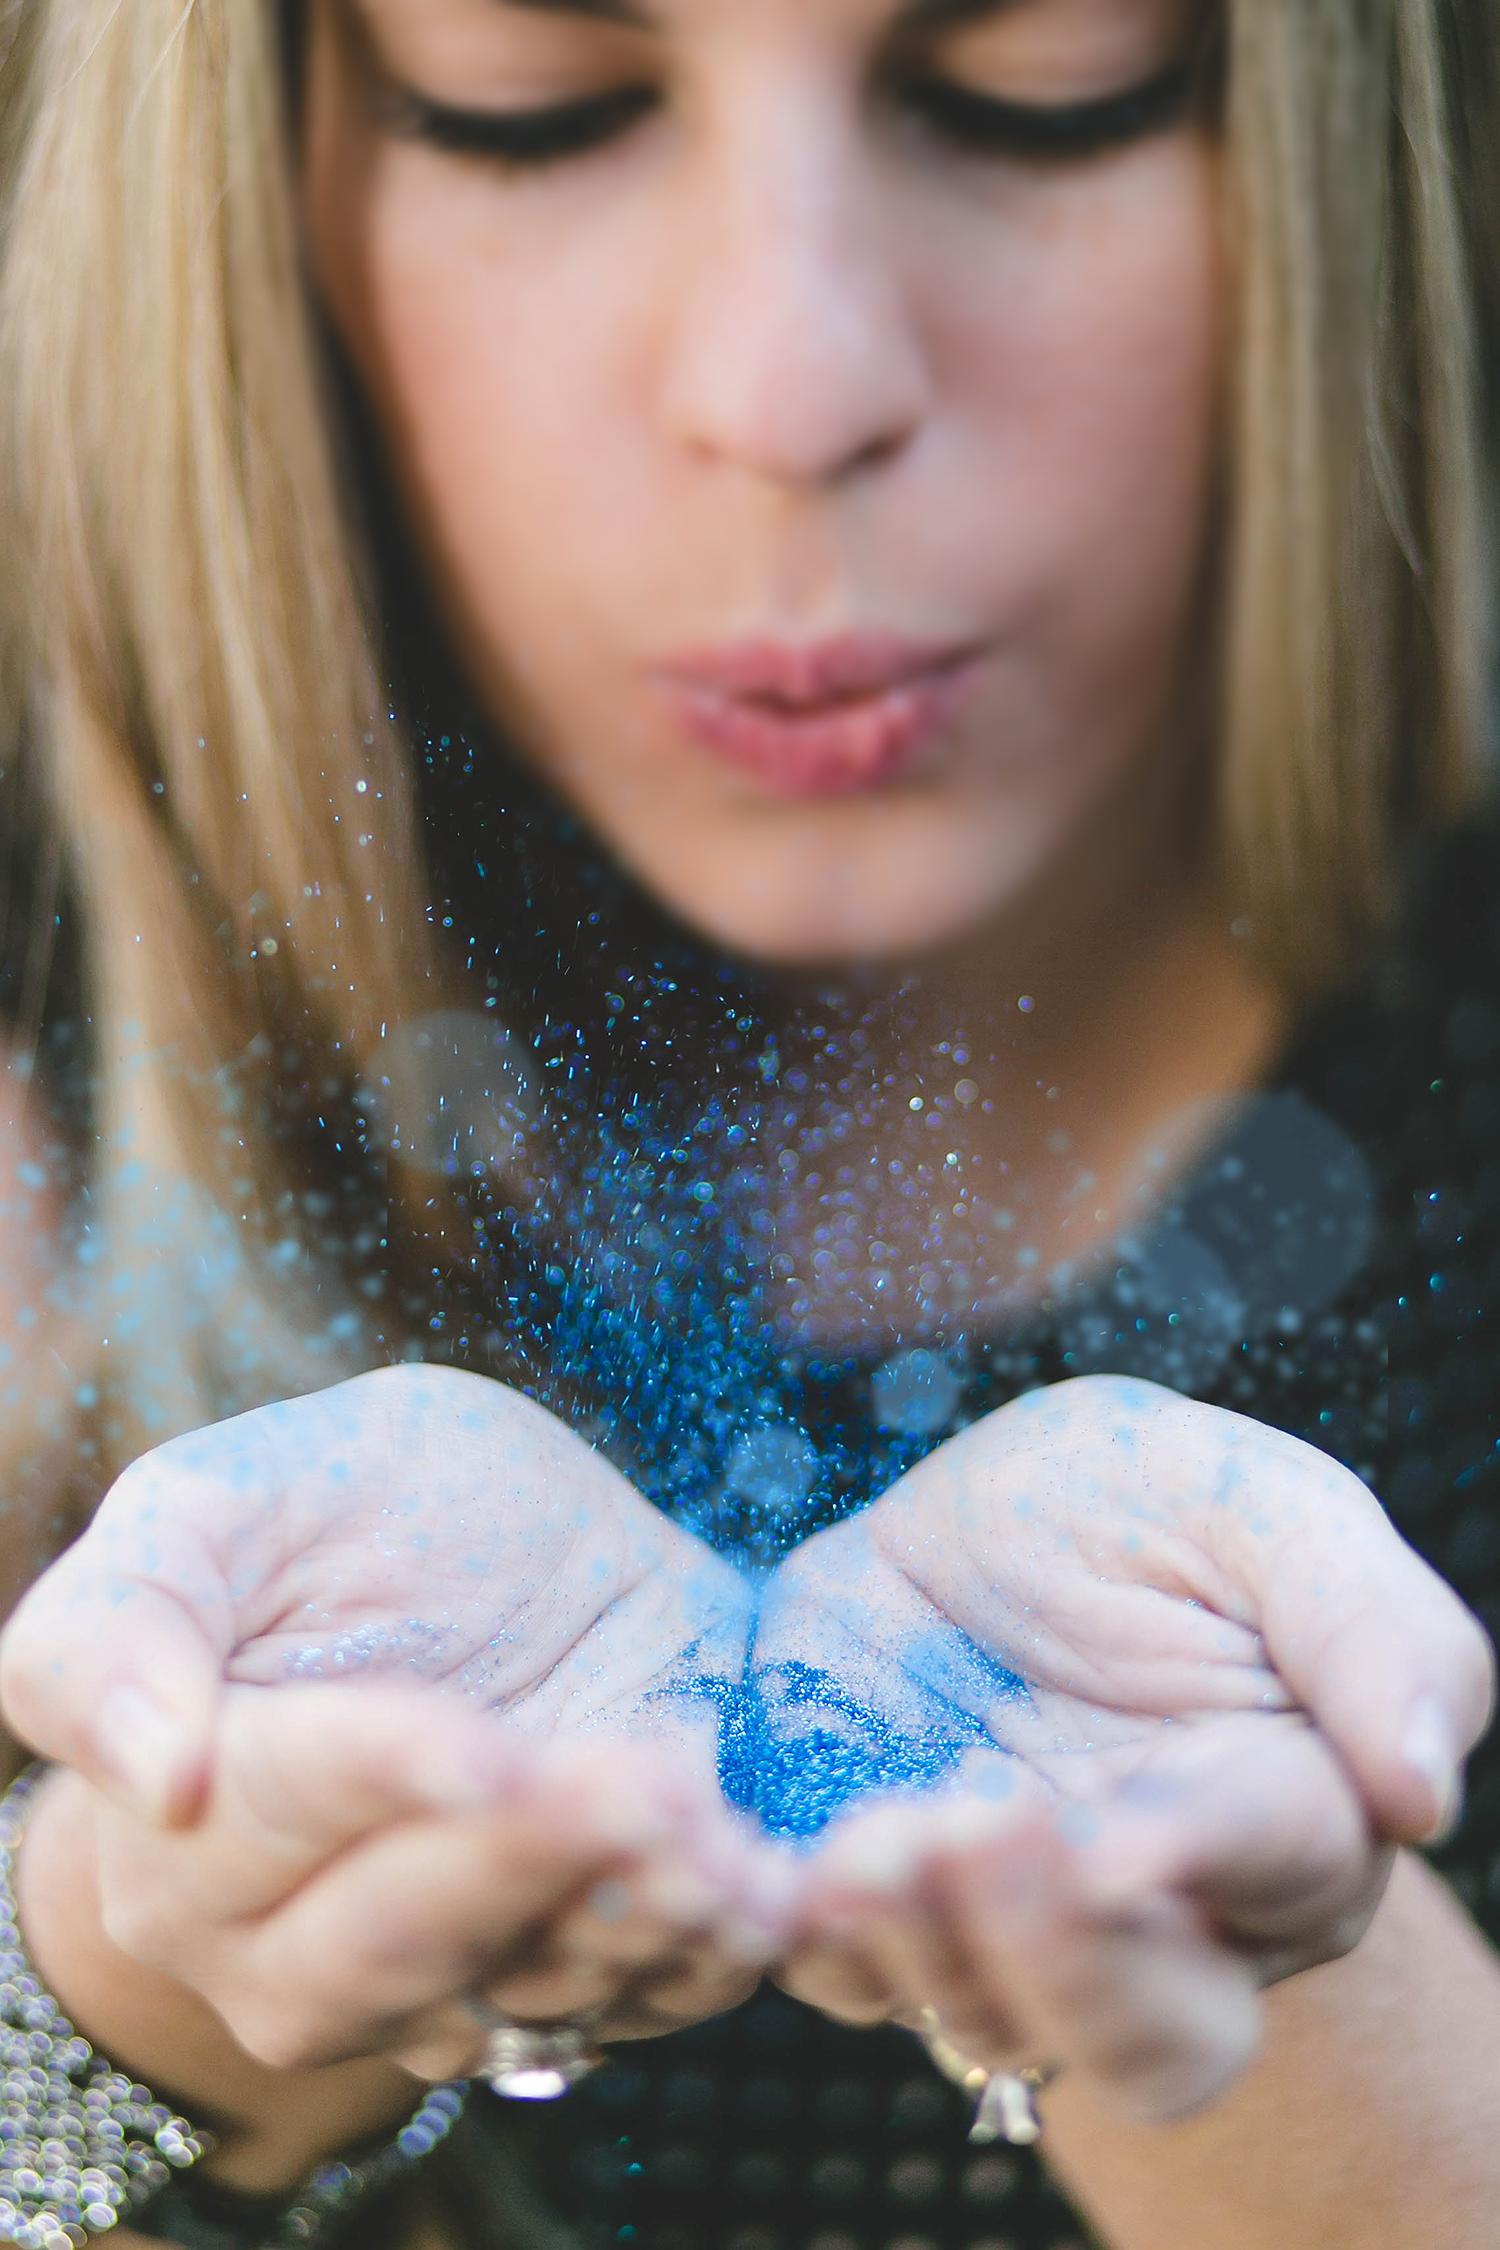 adam-szarmack-engagement-bokeh-blue-dust.jpg